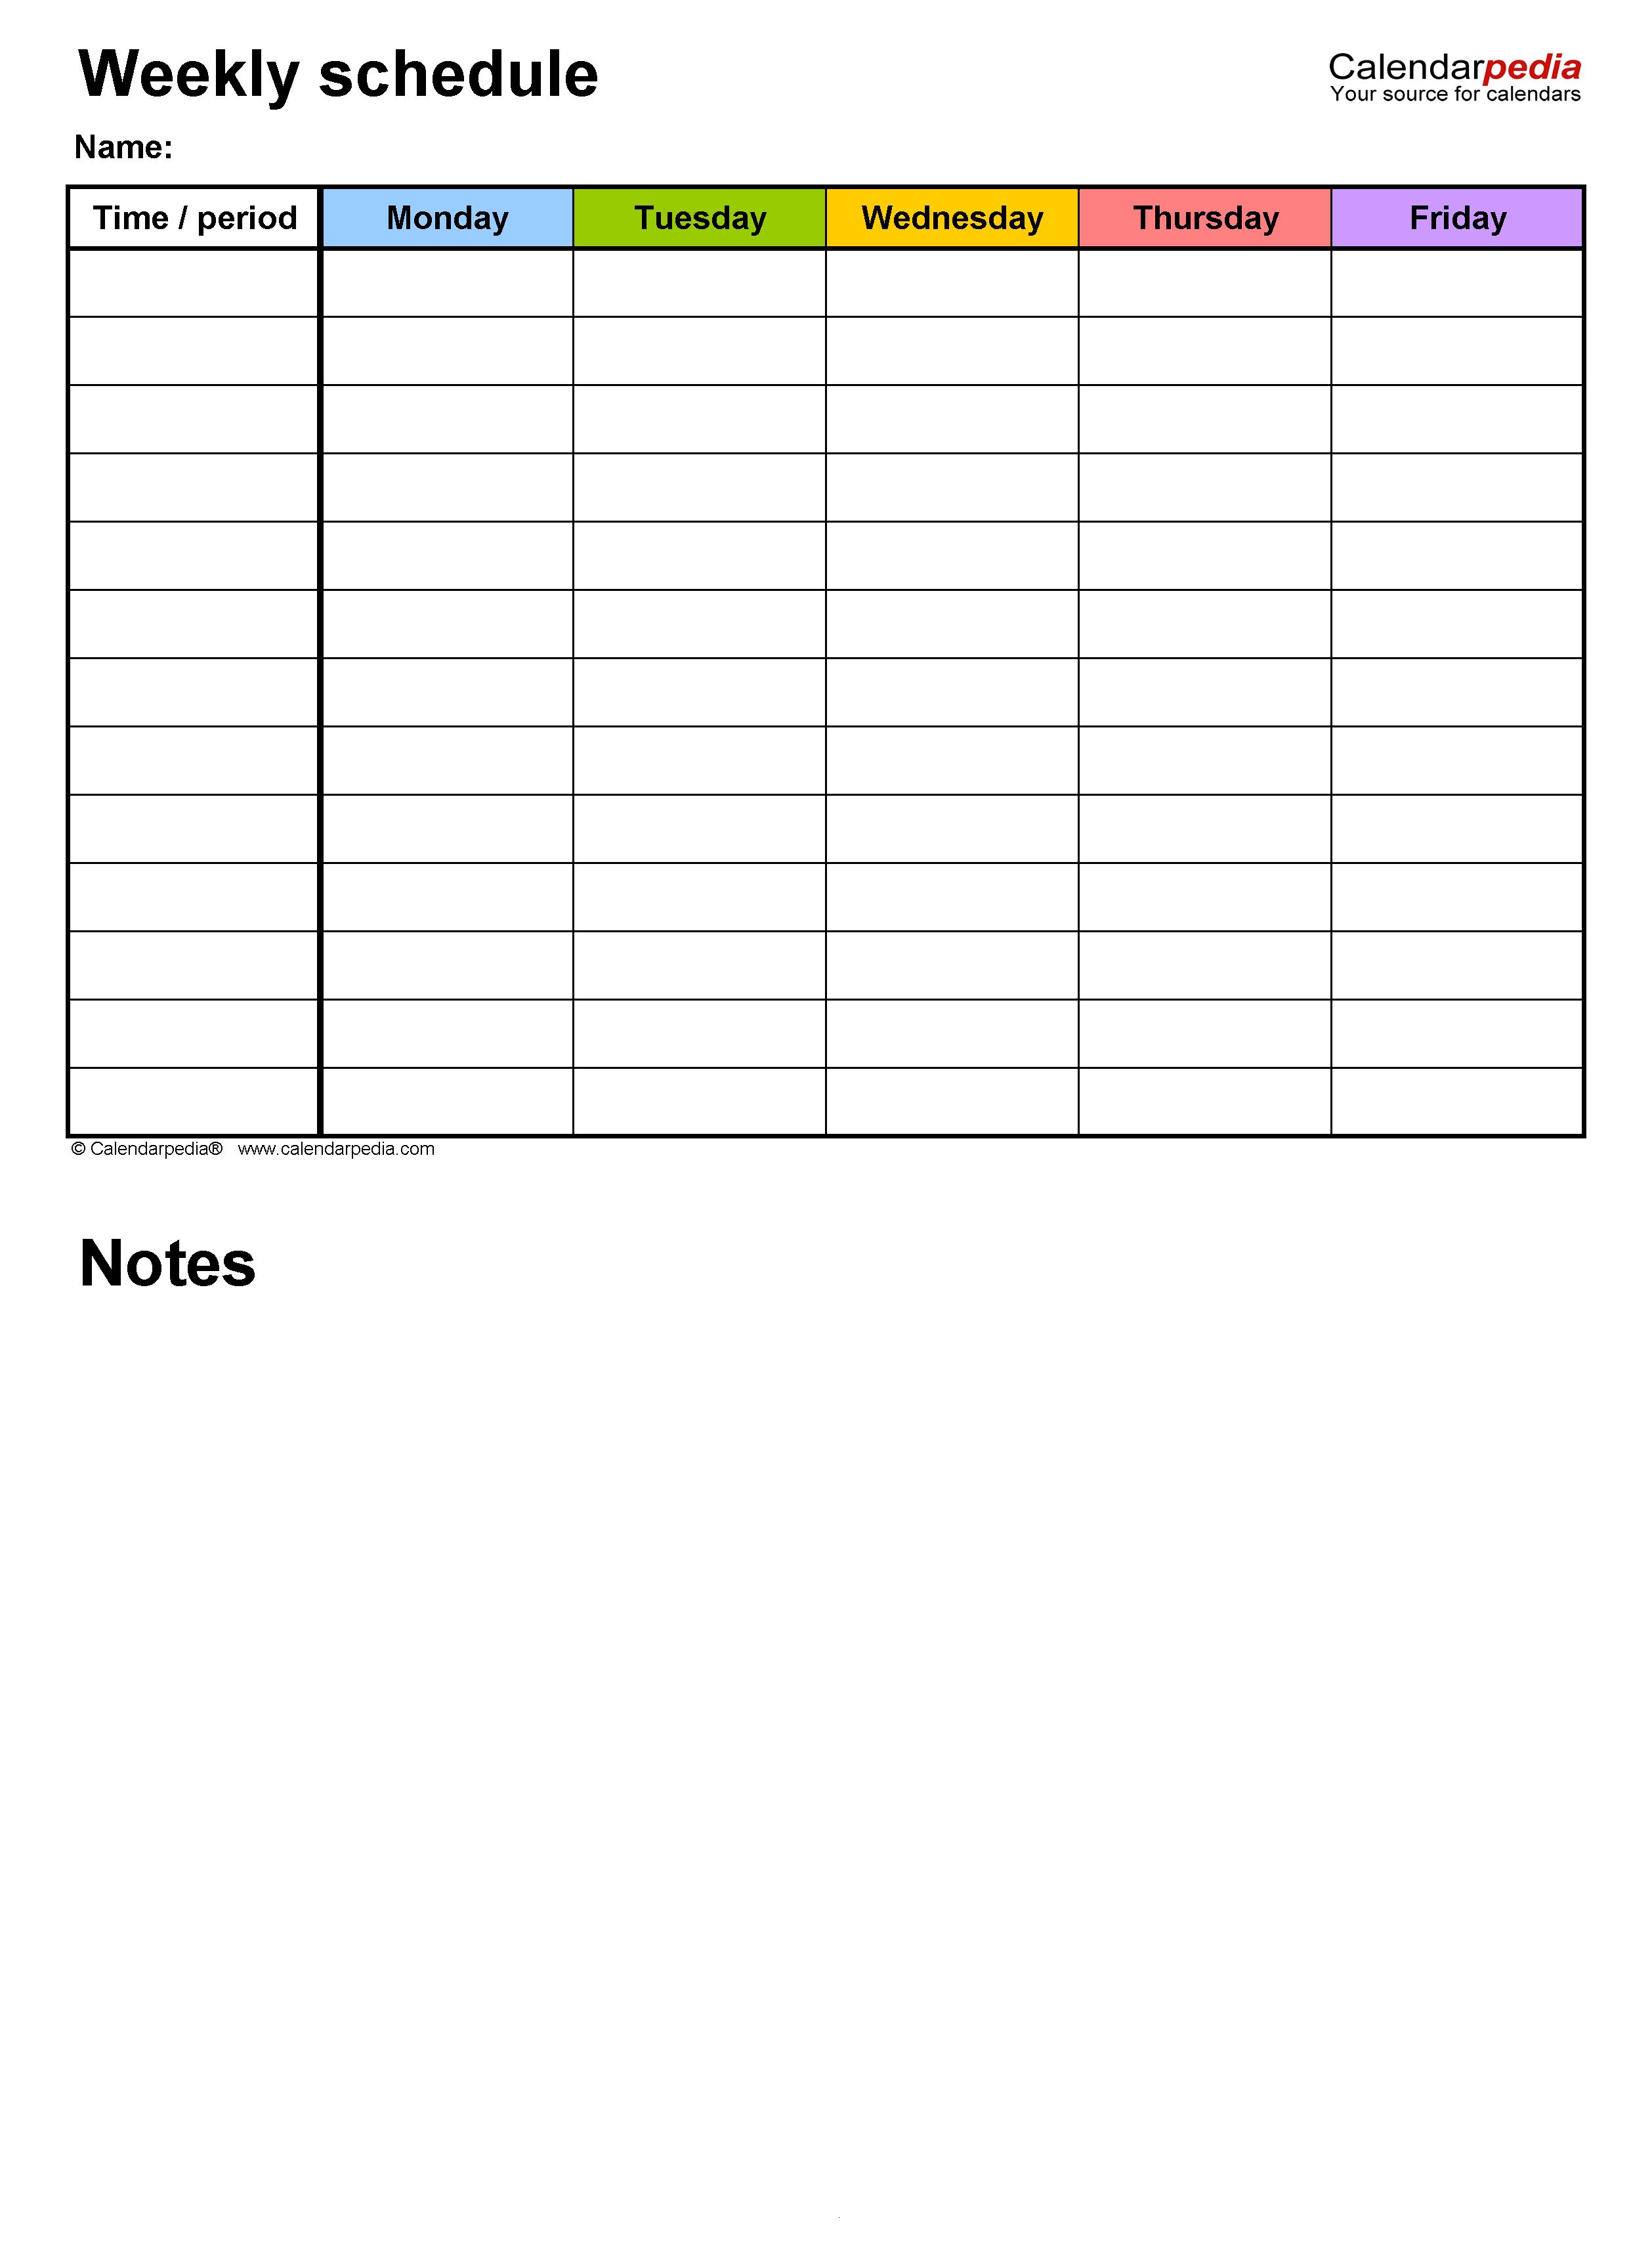 Free Online Schedule Template from www.calendarpedia.com